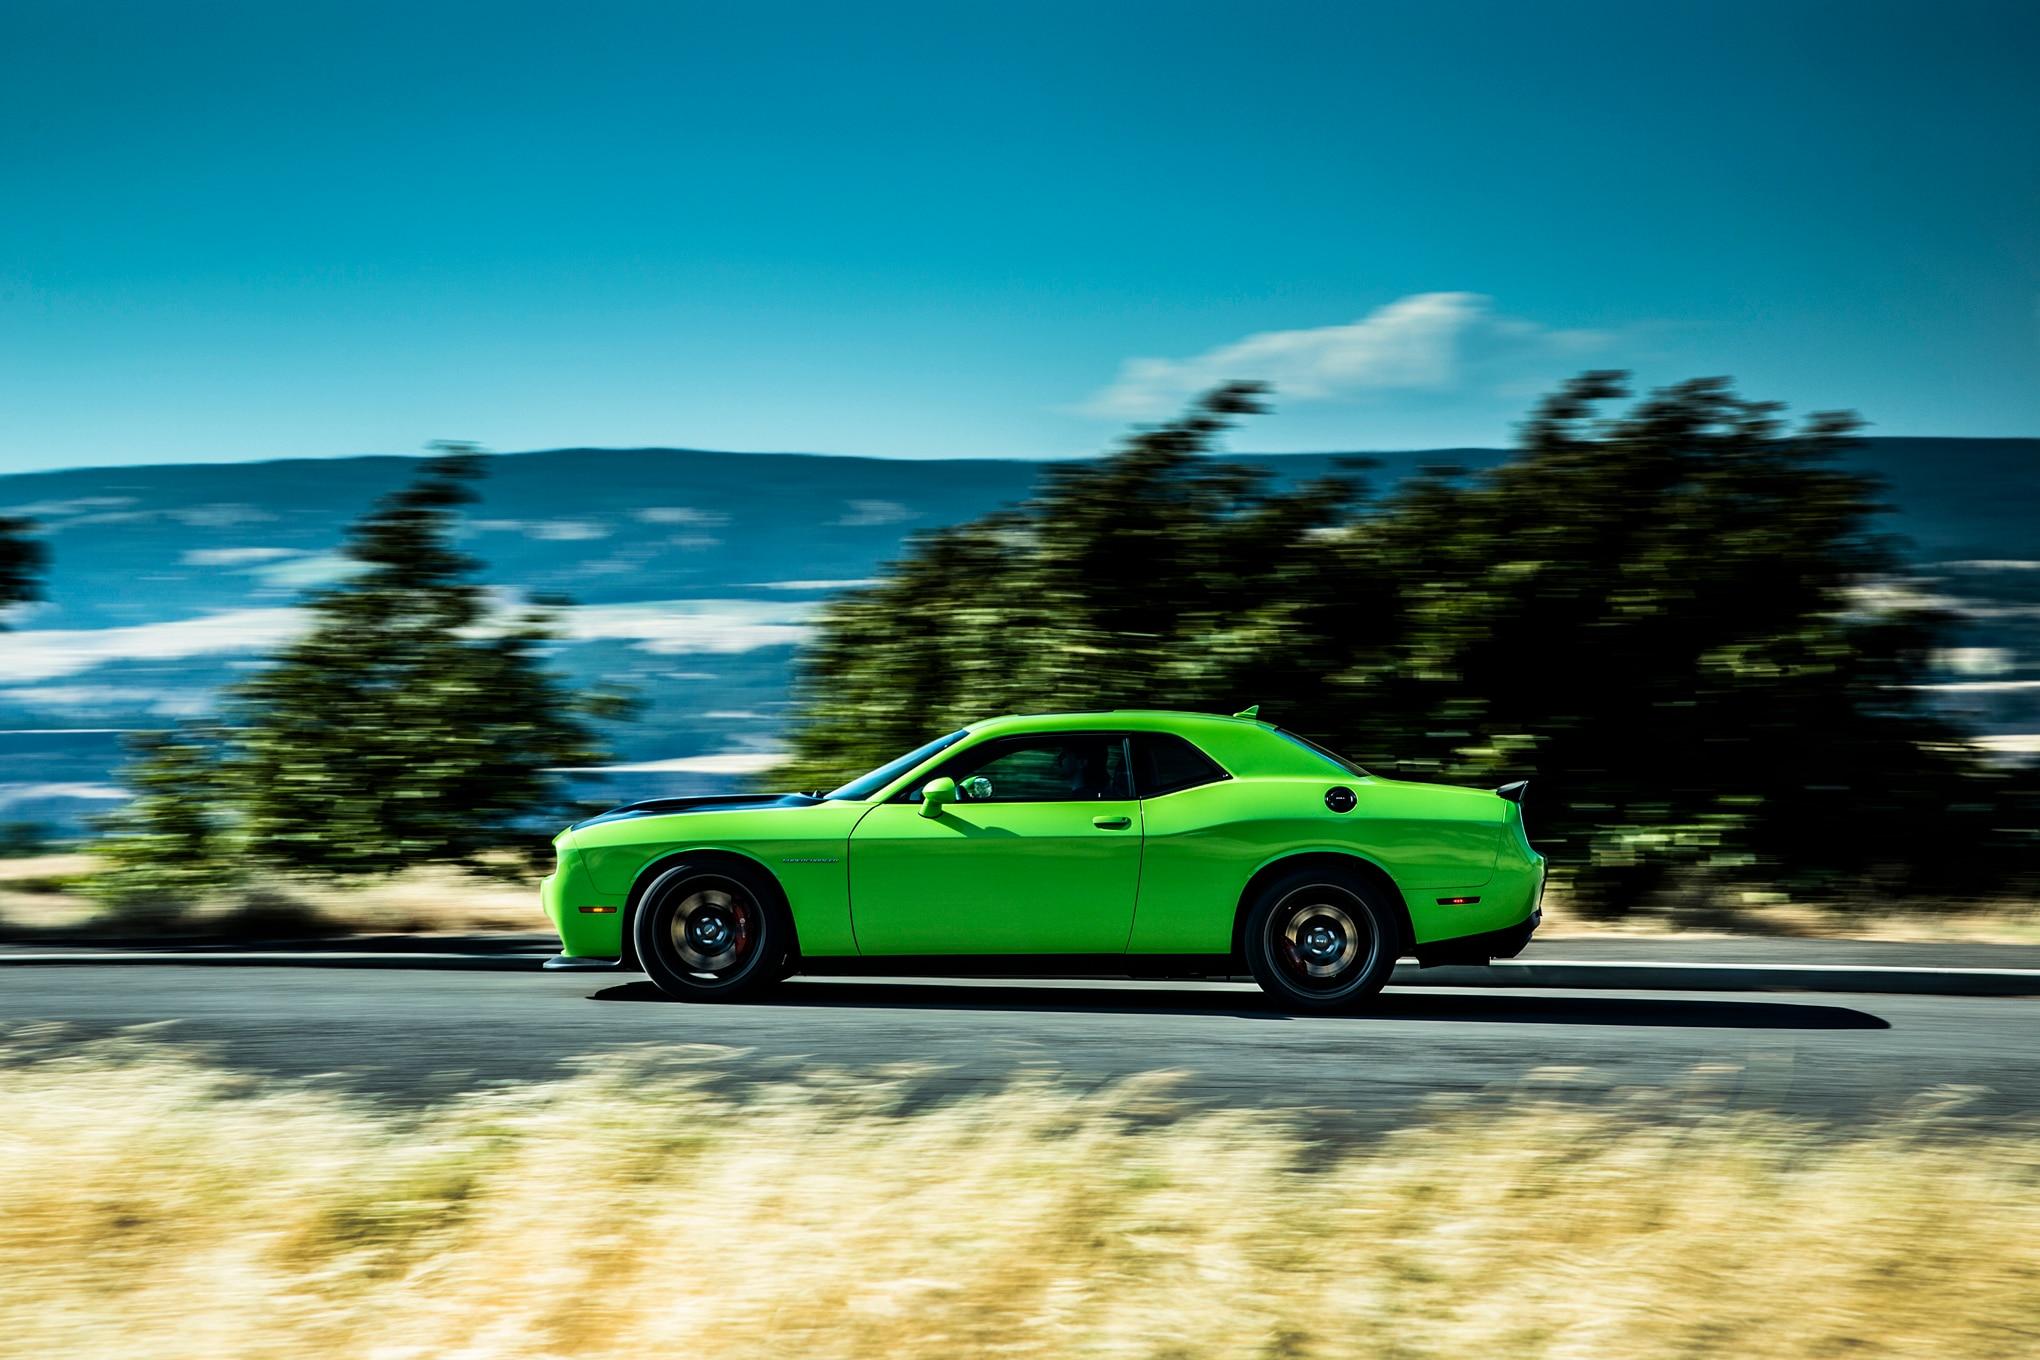 2015 Dodge Challenger SRT Hellcat Side In Motion1